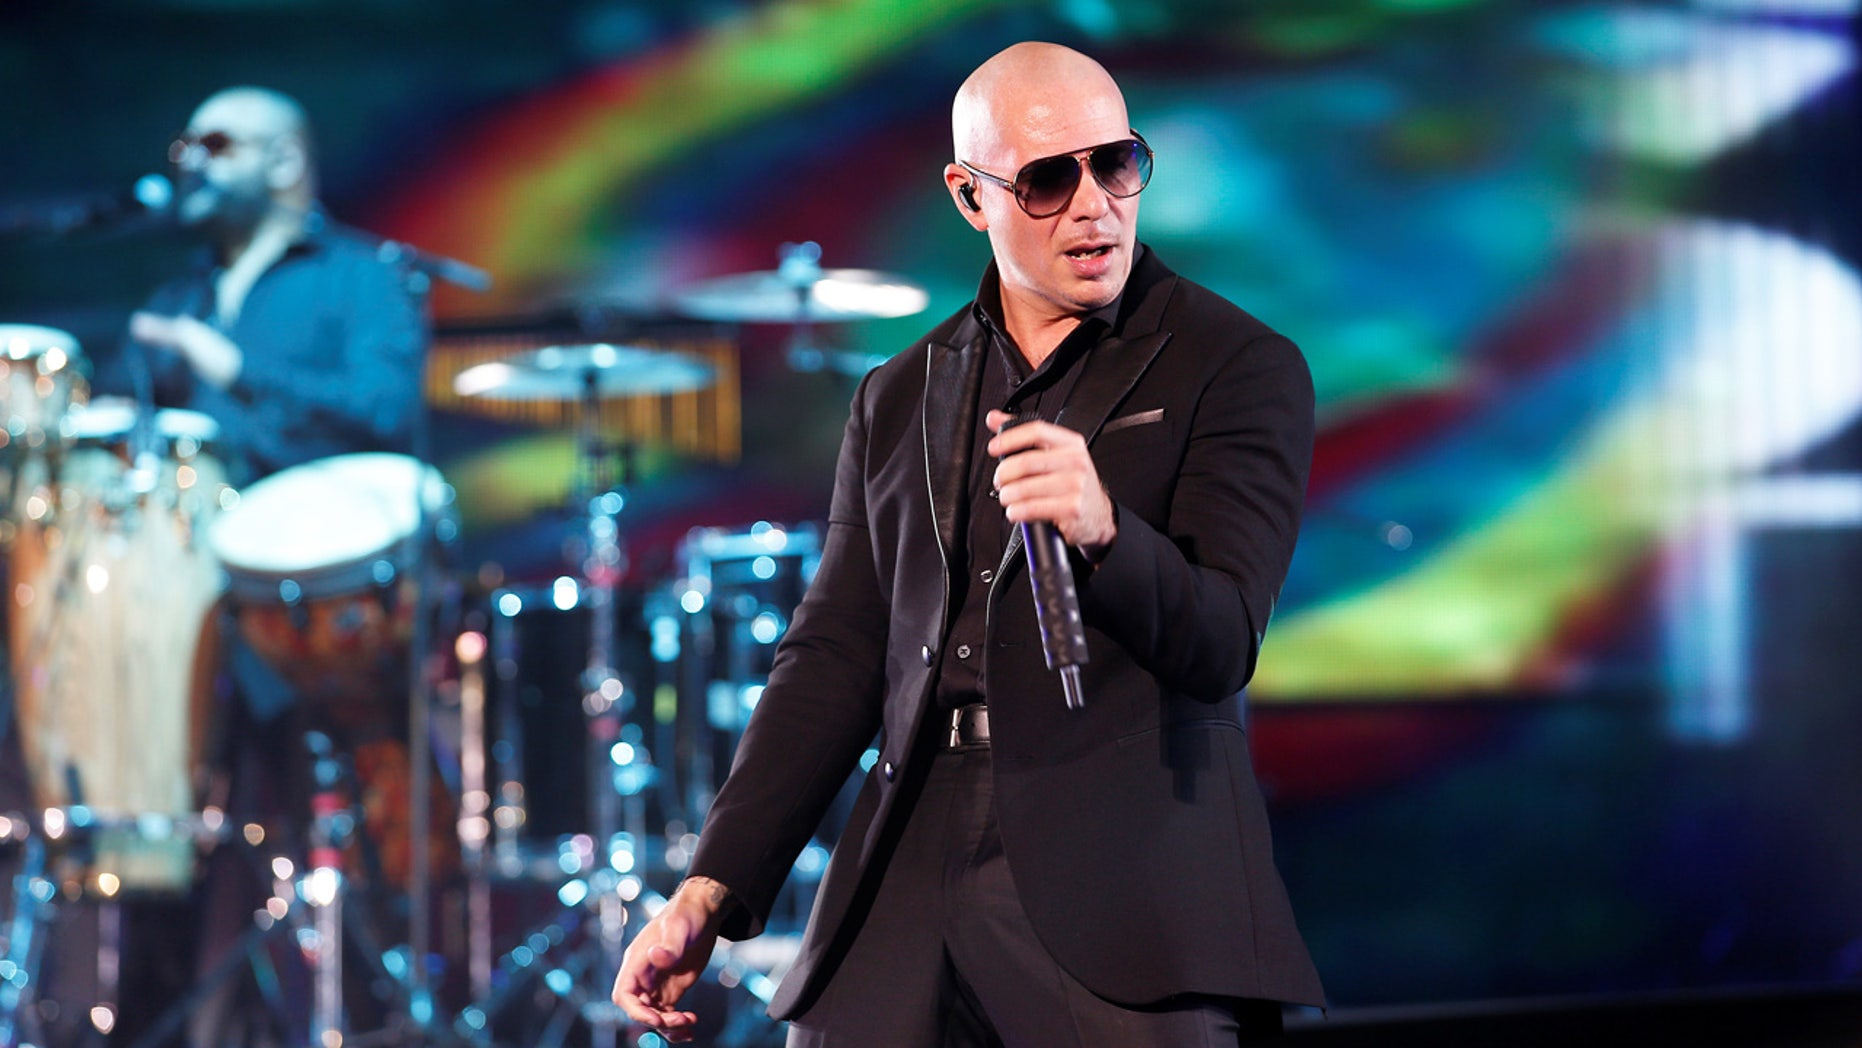 Rapper Pitbull performs during the 15th Mawazine World Rhythms International Music Festival in Rabat, Morocco.